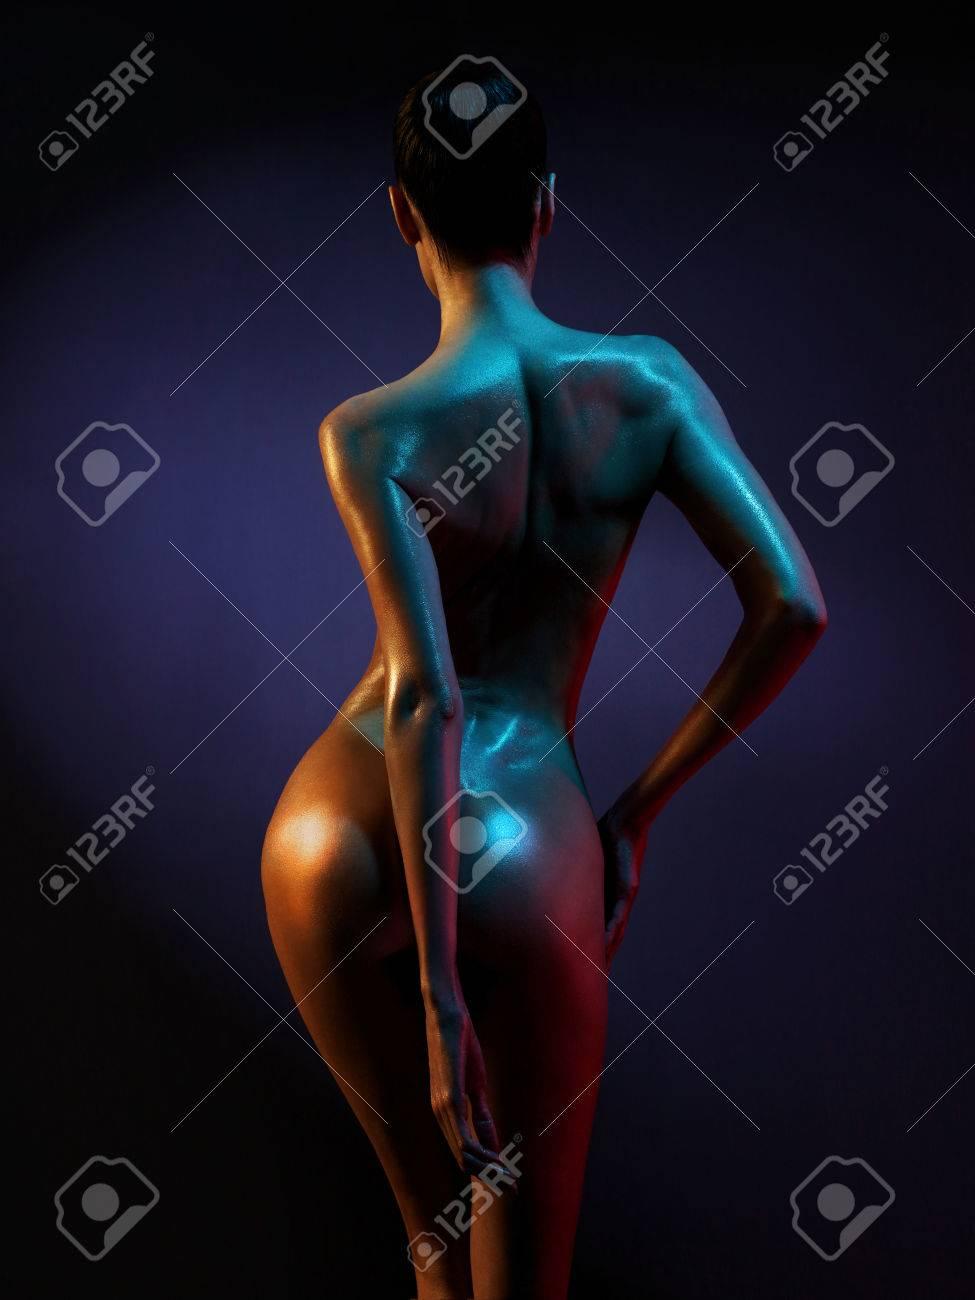 fashion art photo of elegant nude model in the light colored spotlights Standard-Bild - 52039479